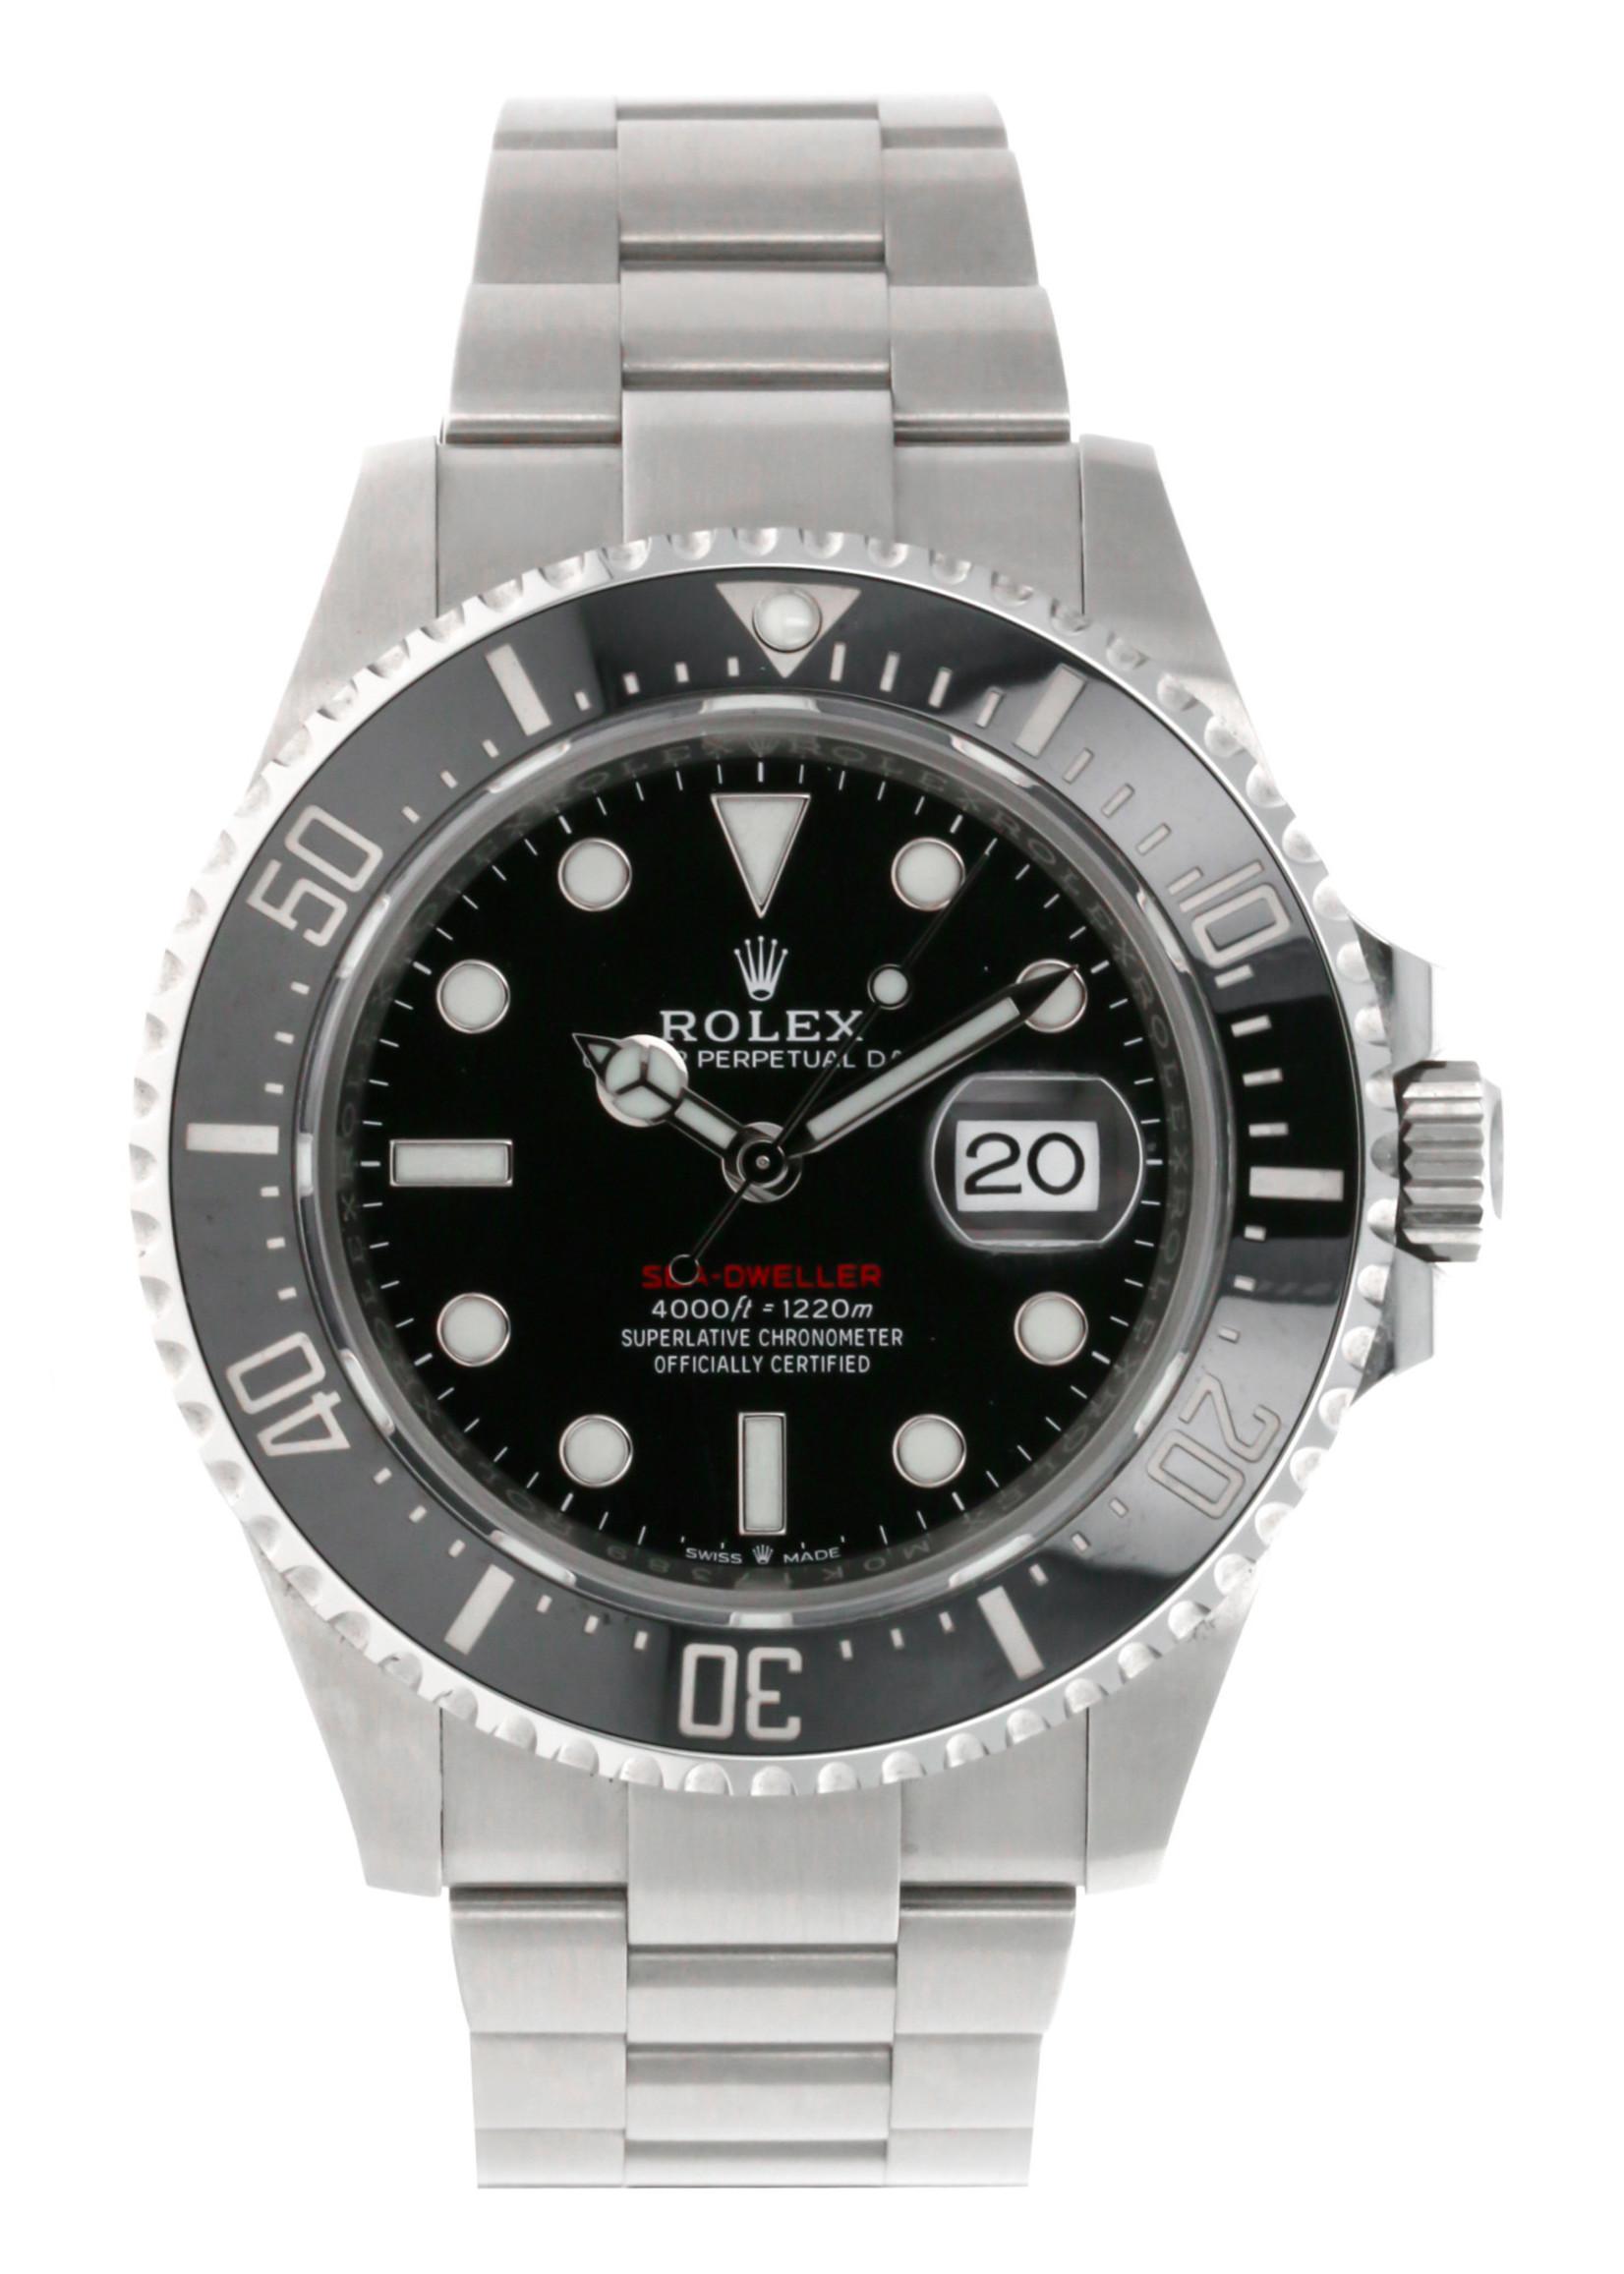 Rolex ROLEX SEADWELLER 43MM 2020(B+P) #126600 BLACK DIAL